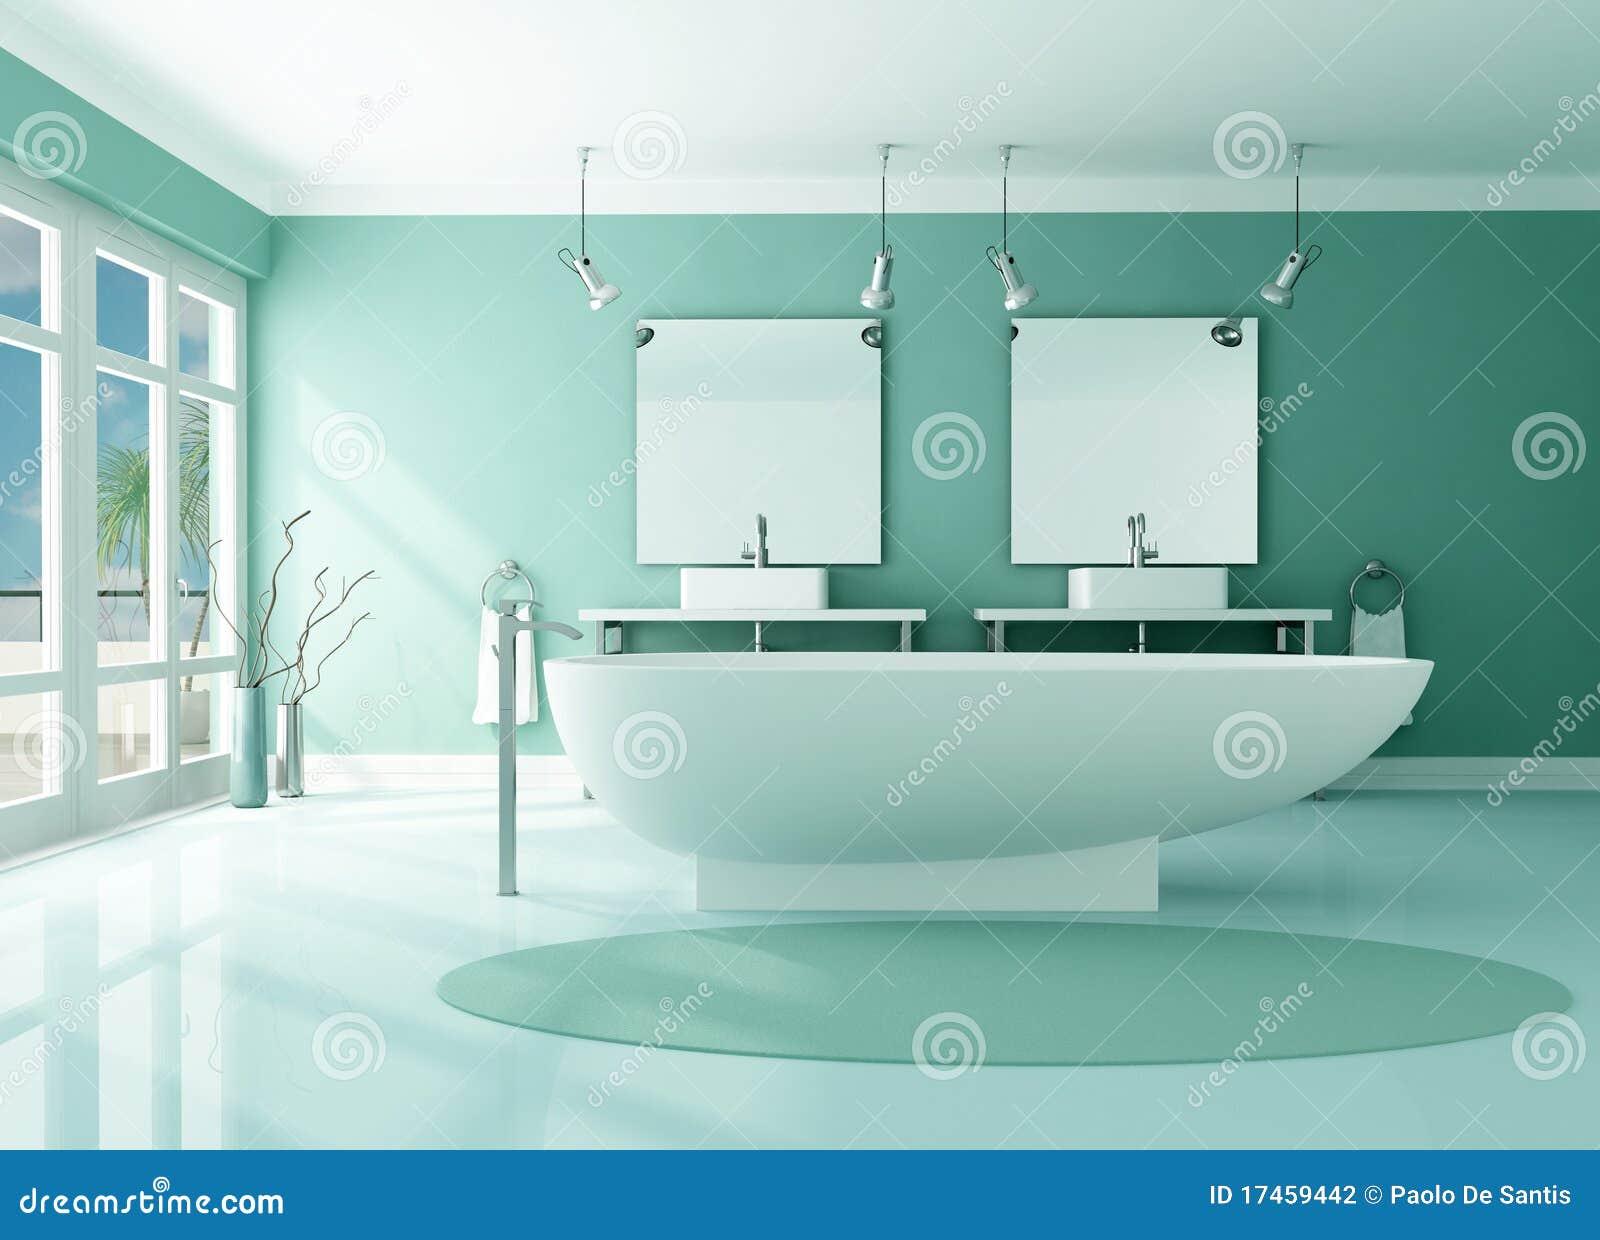 Luxury modern bathroom stock illustration image of comfy 17459442 - Salle de bain de luxe moderne ...